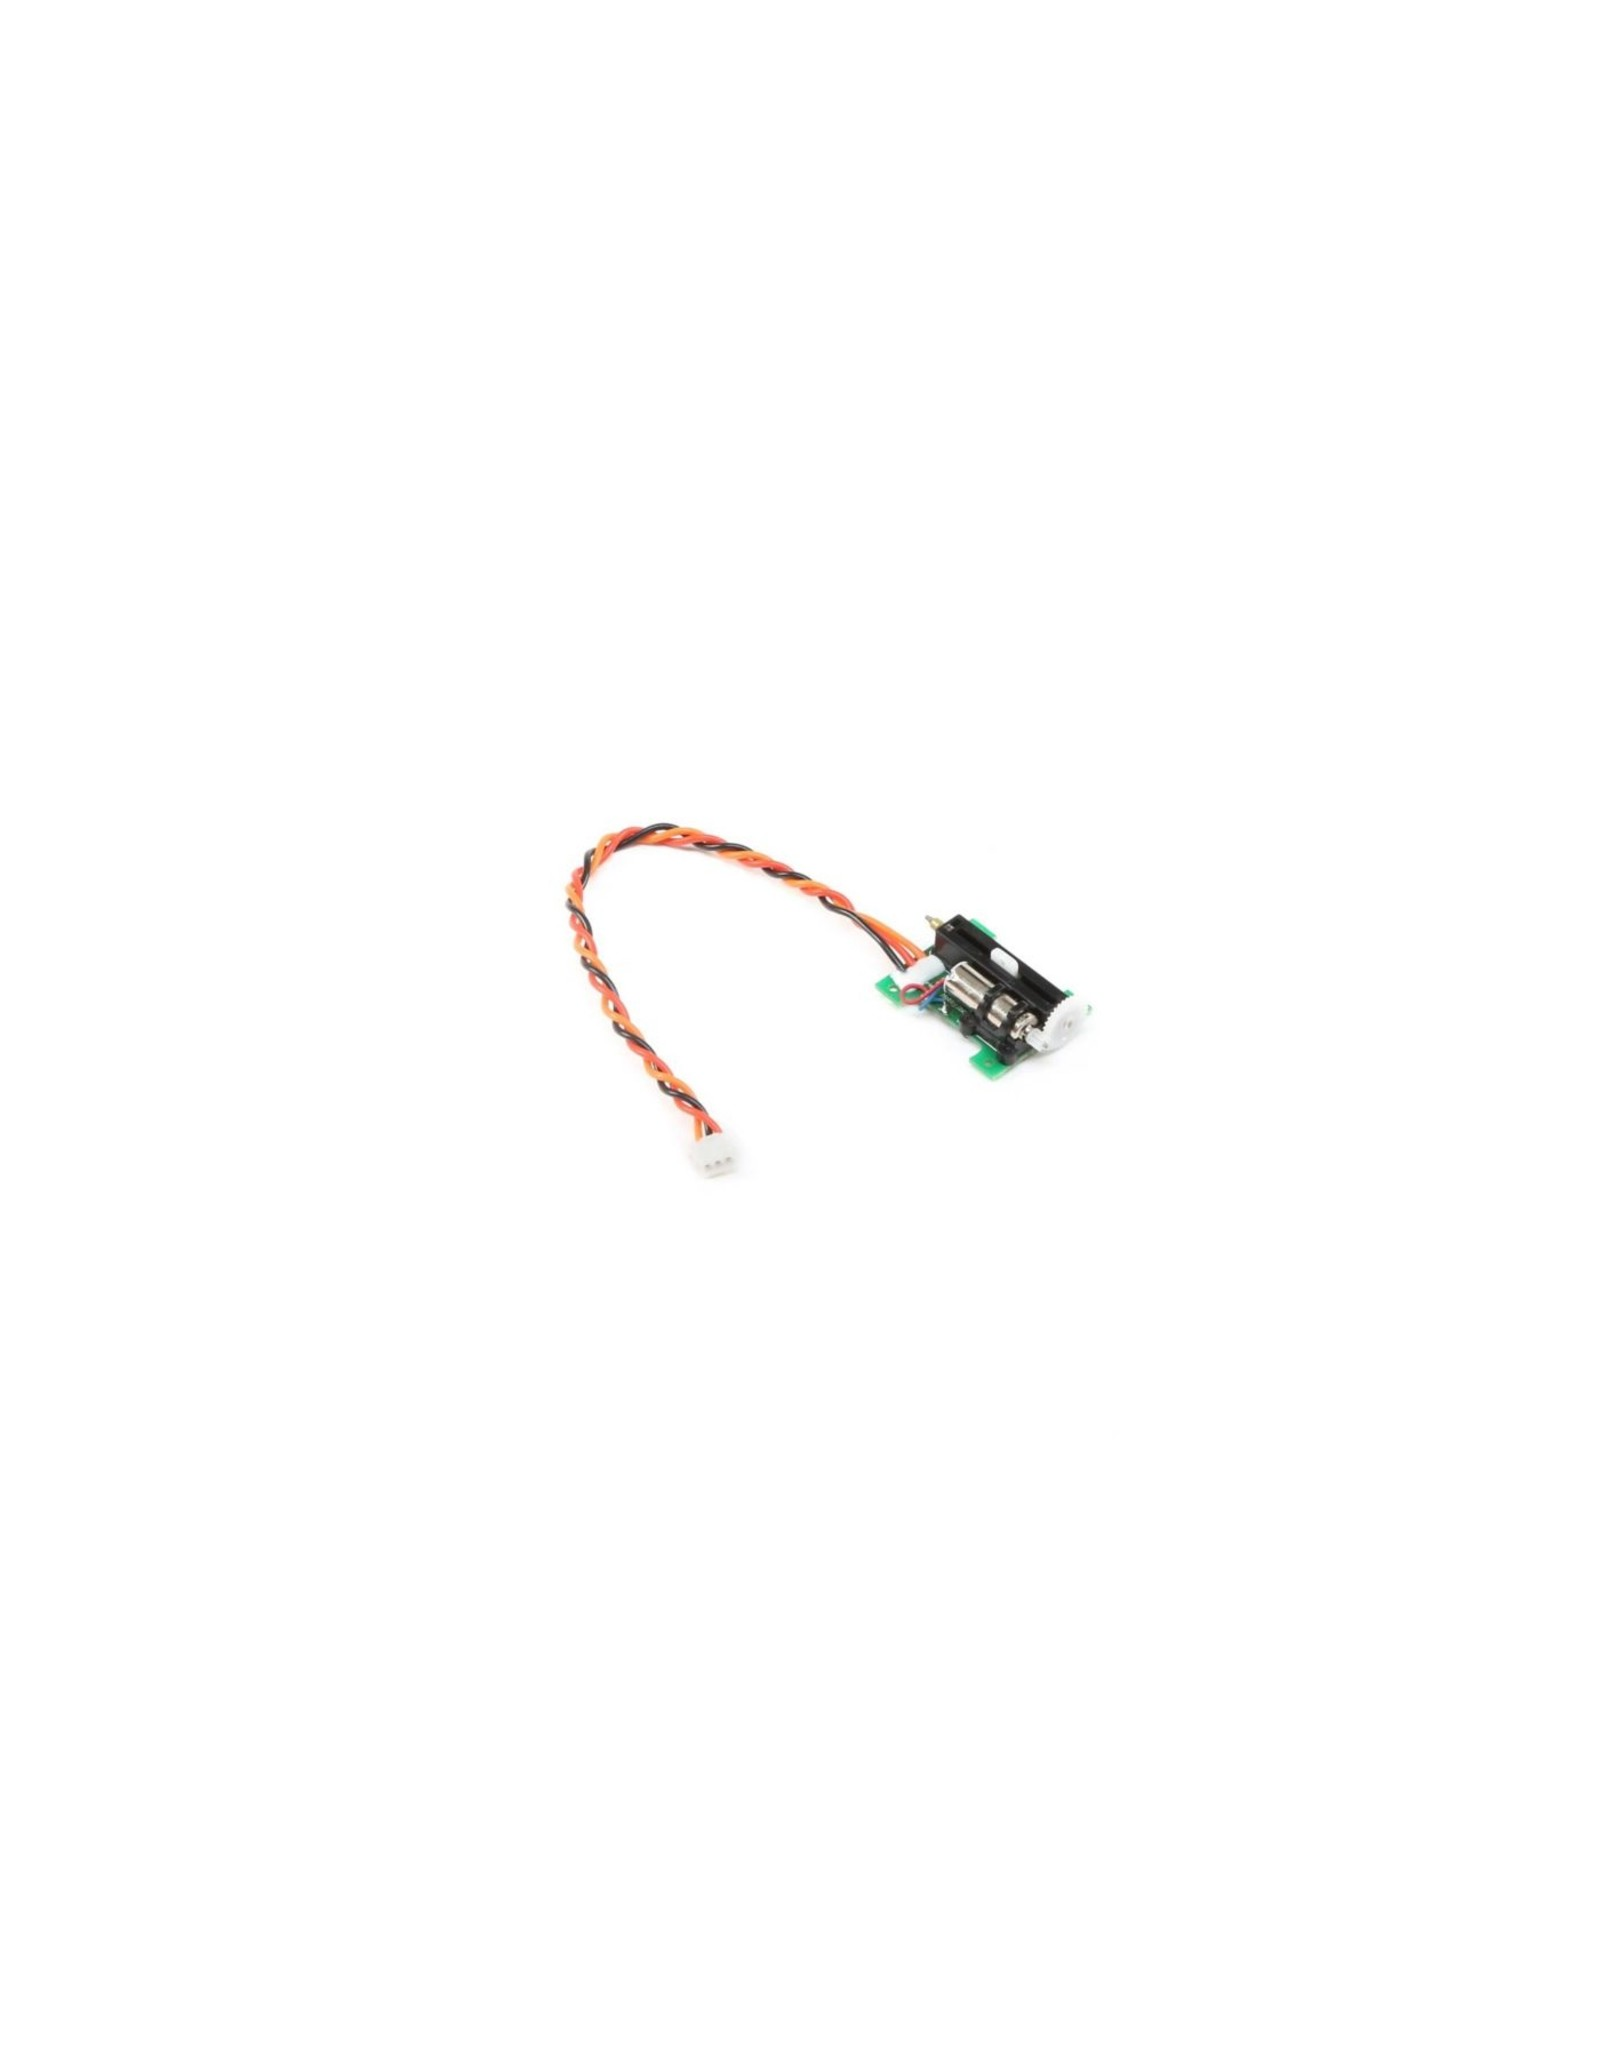 Spektrum SH2045L - 2.9g Linear Long Throw Servo: 130 S